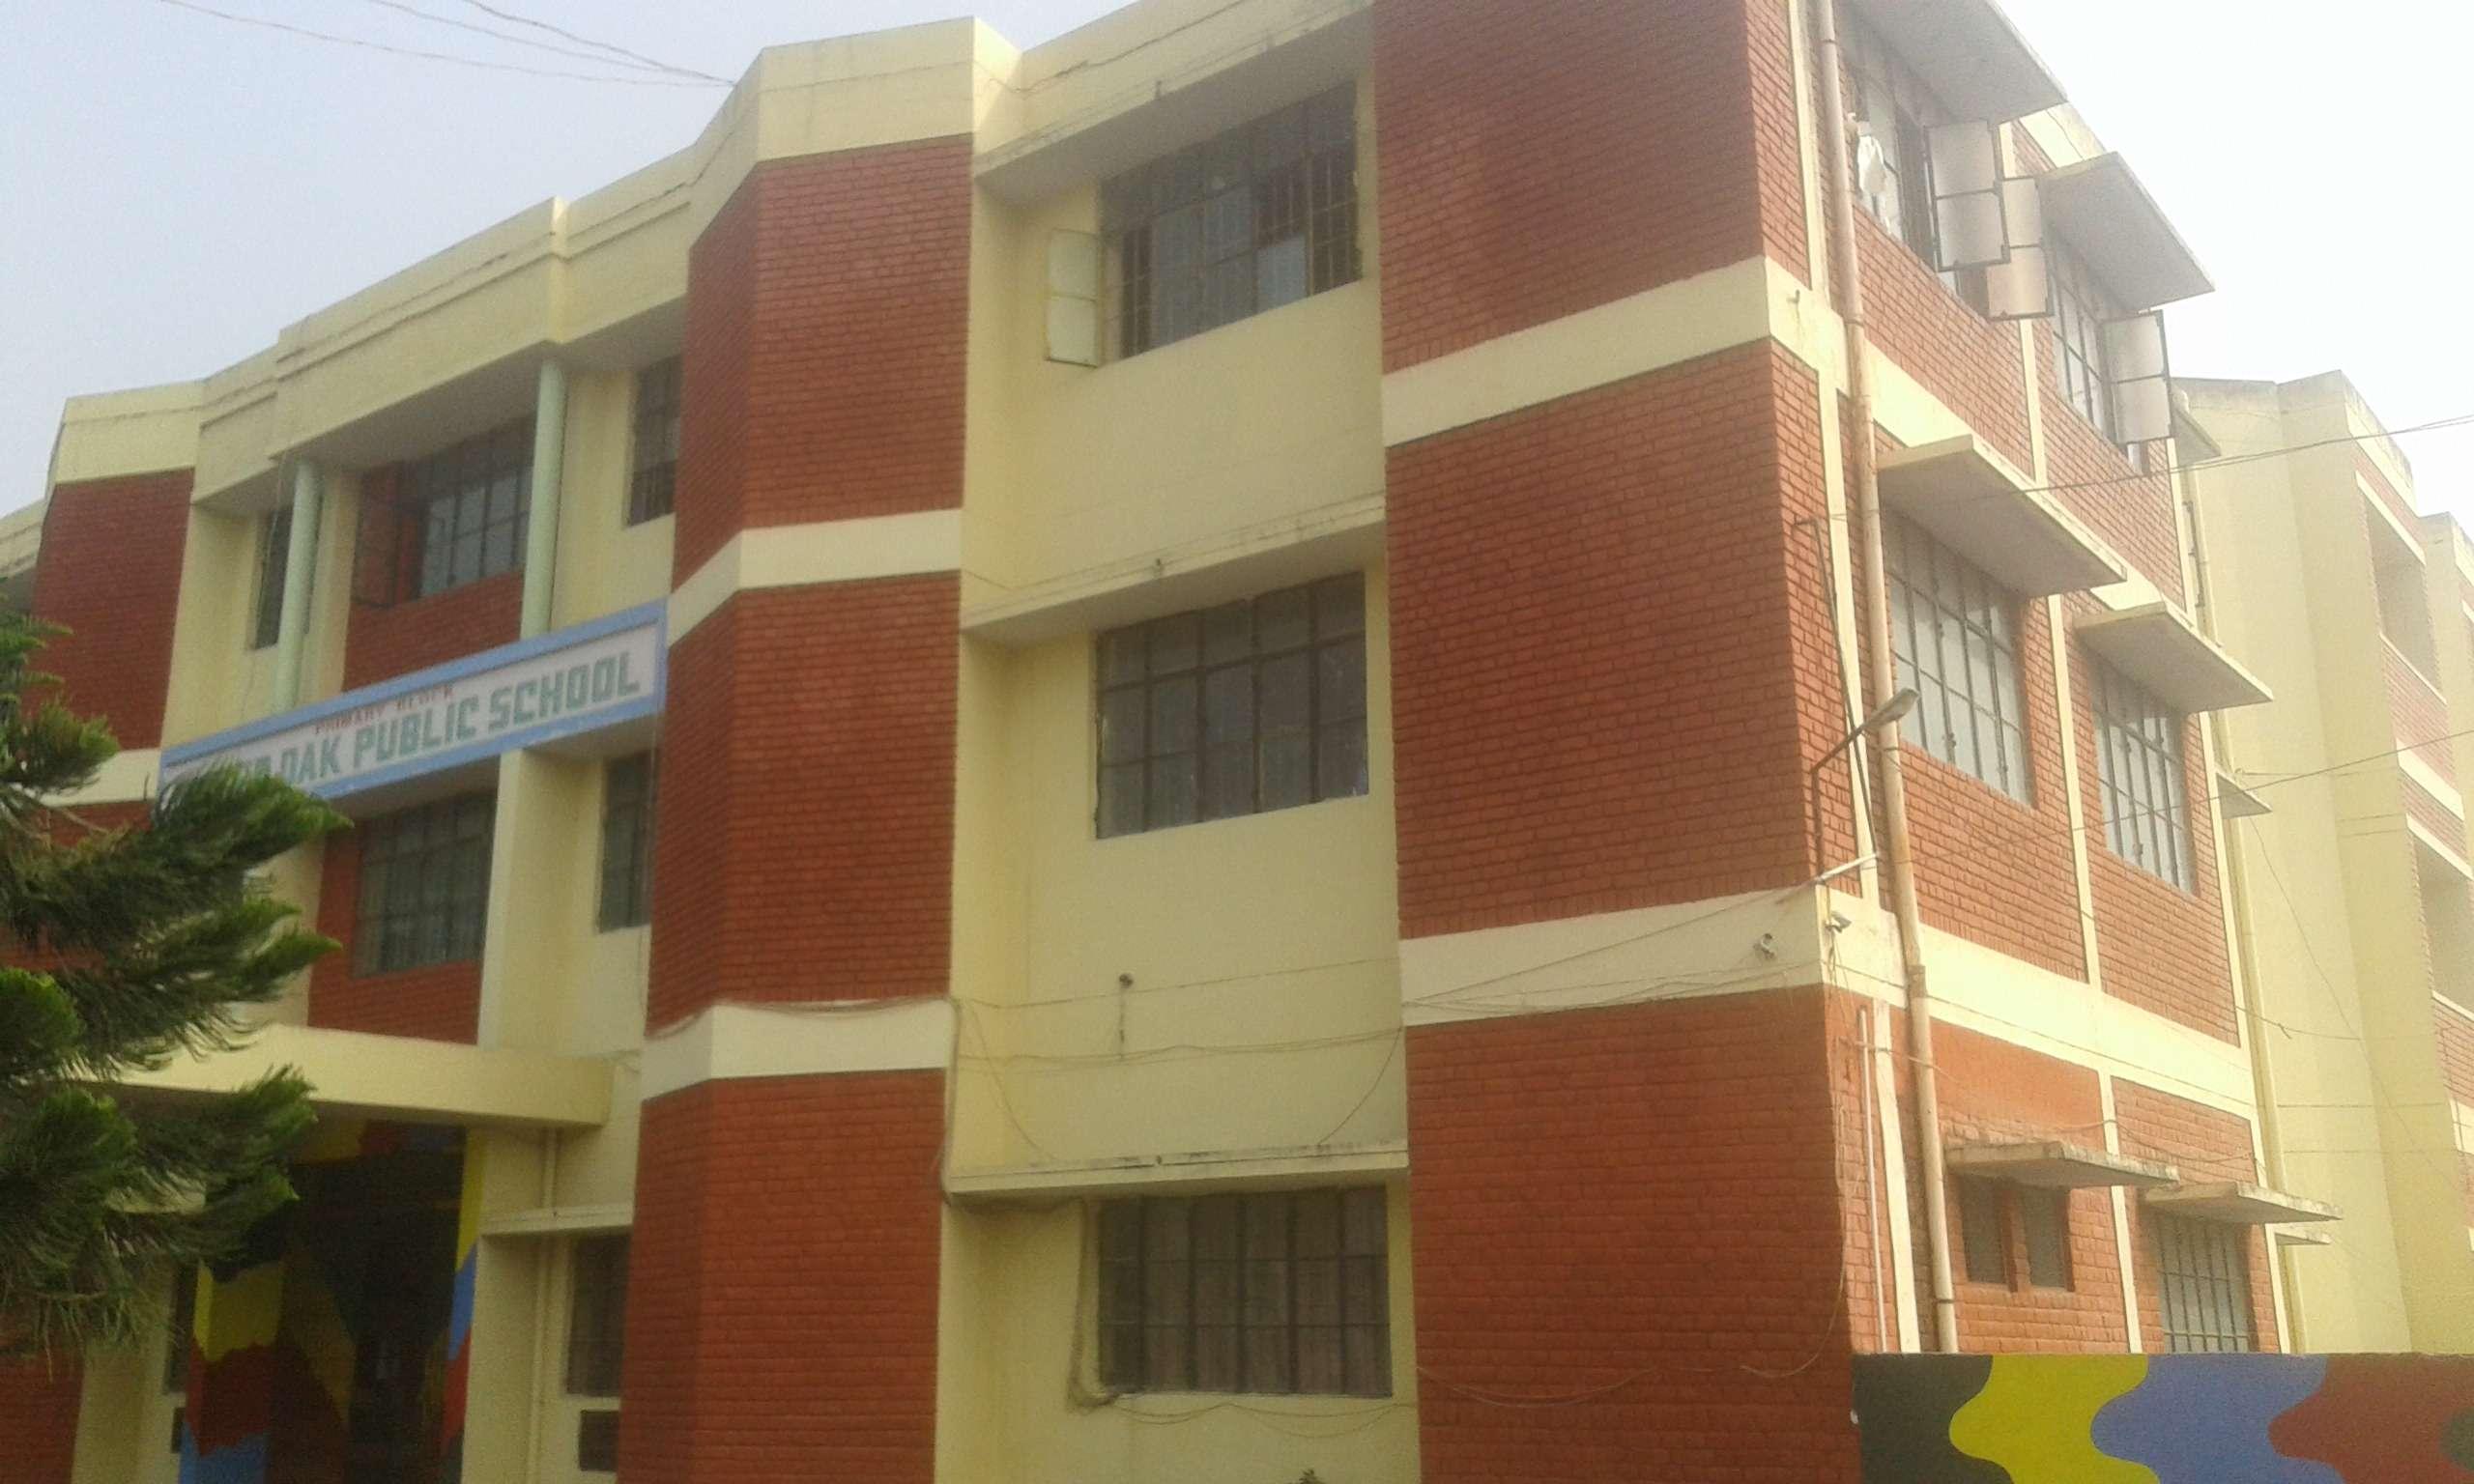 SILVER OAK PUBLIC SCHOOL BY PASS ROAD GANGOH SAHARANPUR UTTAR PRADESH 2130591